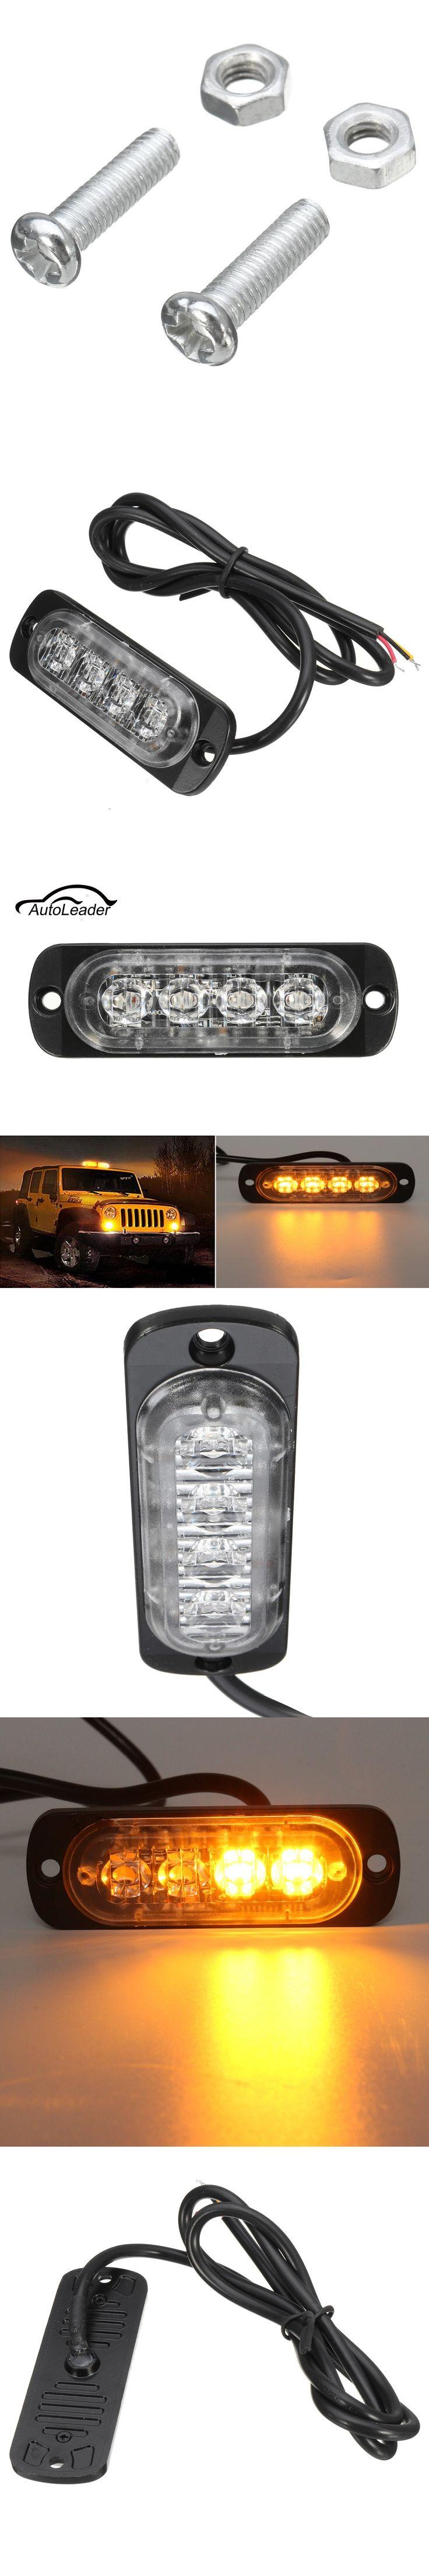 4 LED Car Truck Flash Emergency Beacon Warning Light Bar Hazard Strobe Amber